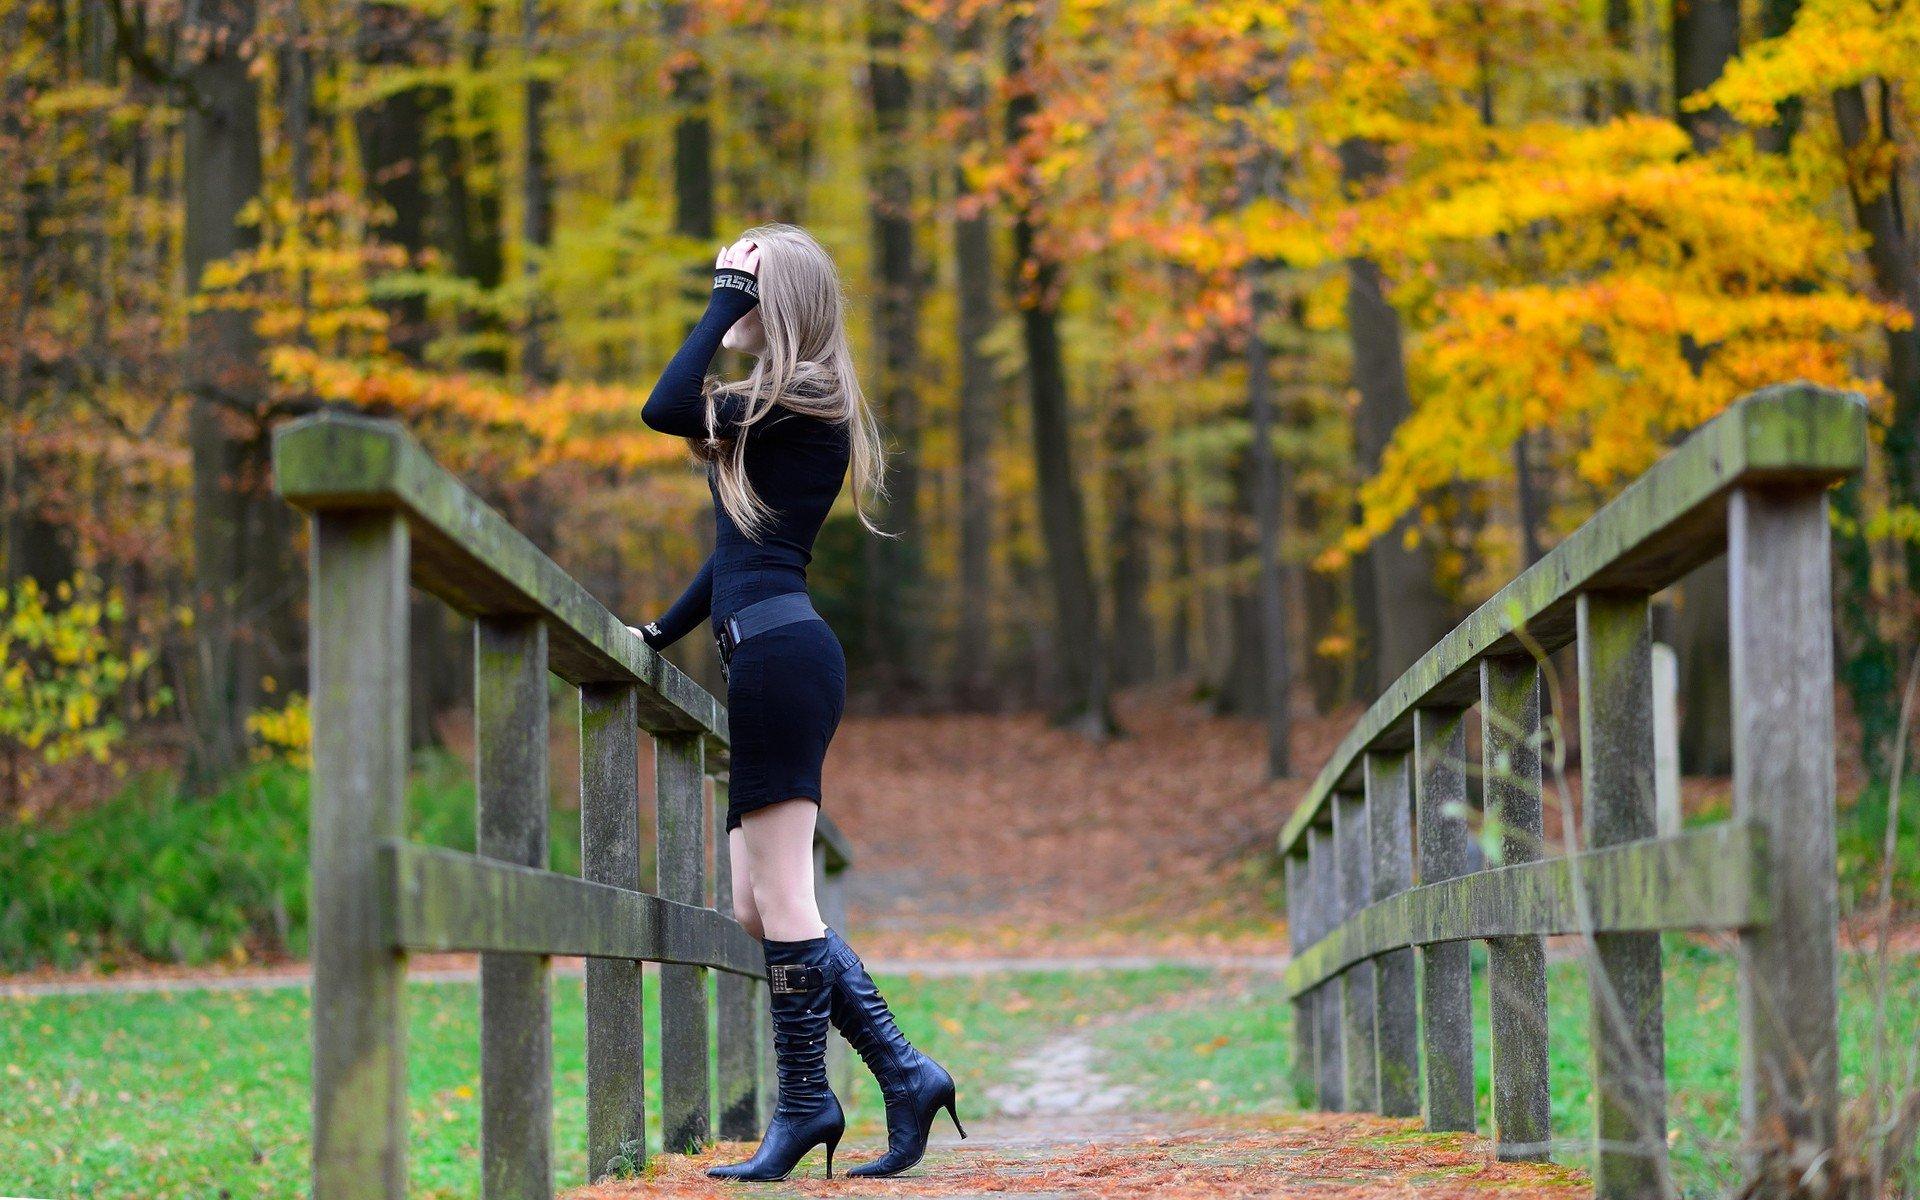 Blonde Girl Photo Wallpaper 2560x1440 Women Model Blonde Long Hair Nature Women Outdoors